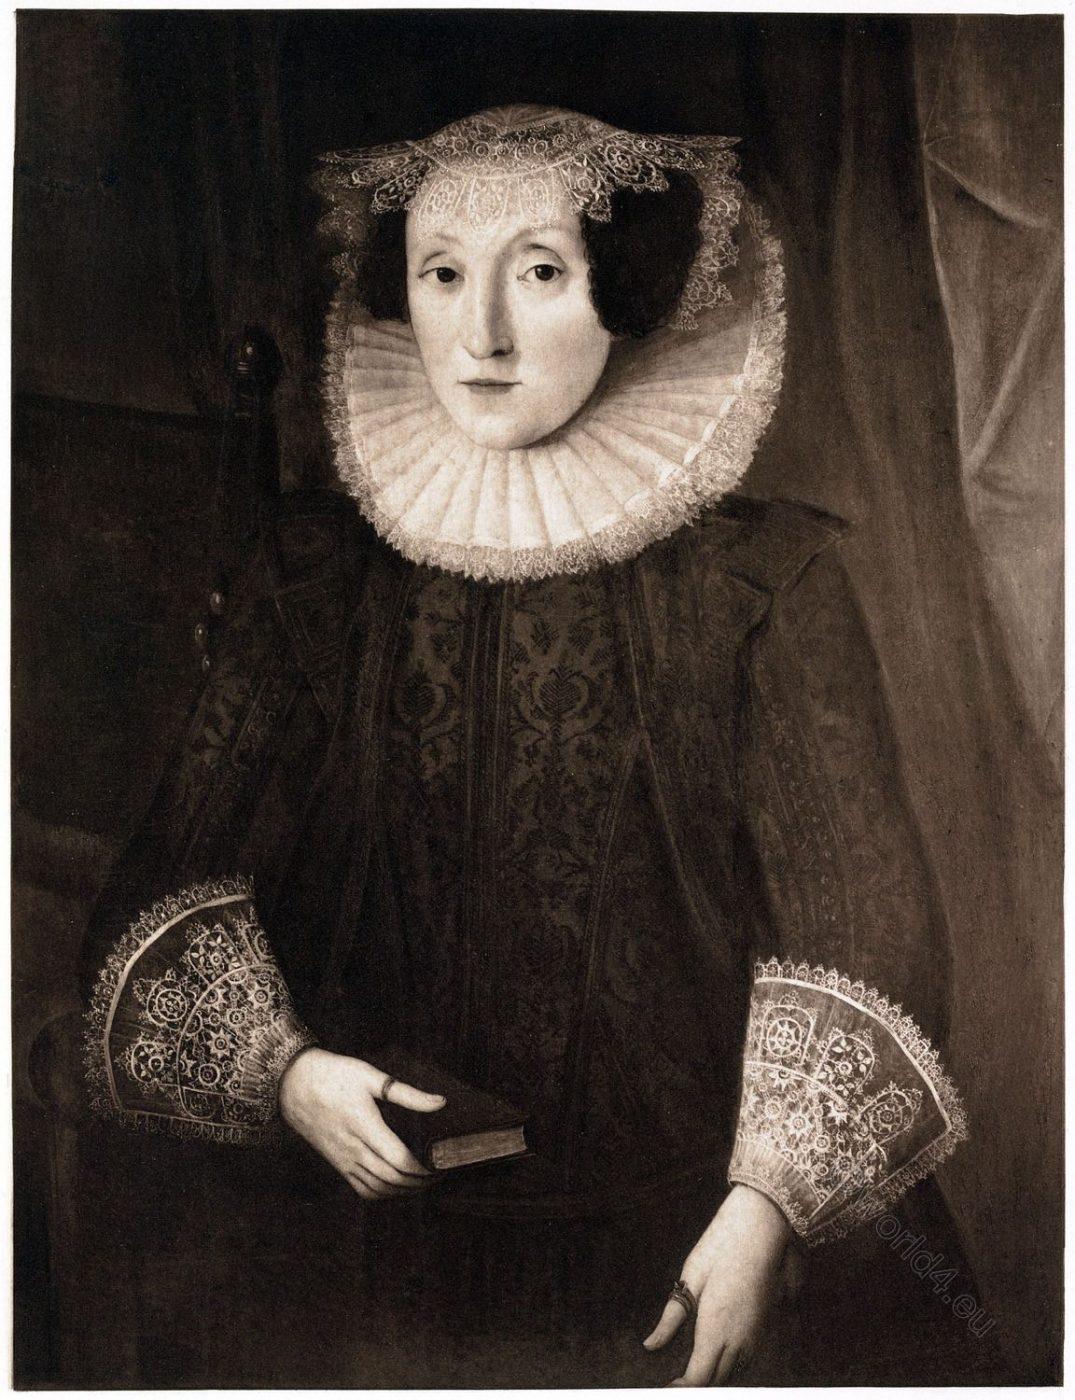 Mary, Sidney, Herbert, Countess, Pembroke, Marcus Gheeraerts, Marc Geerarts